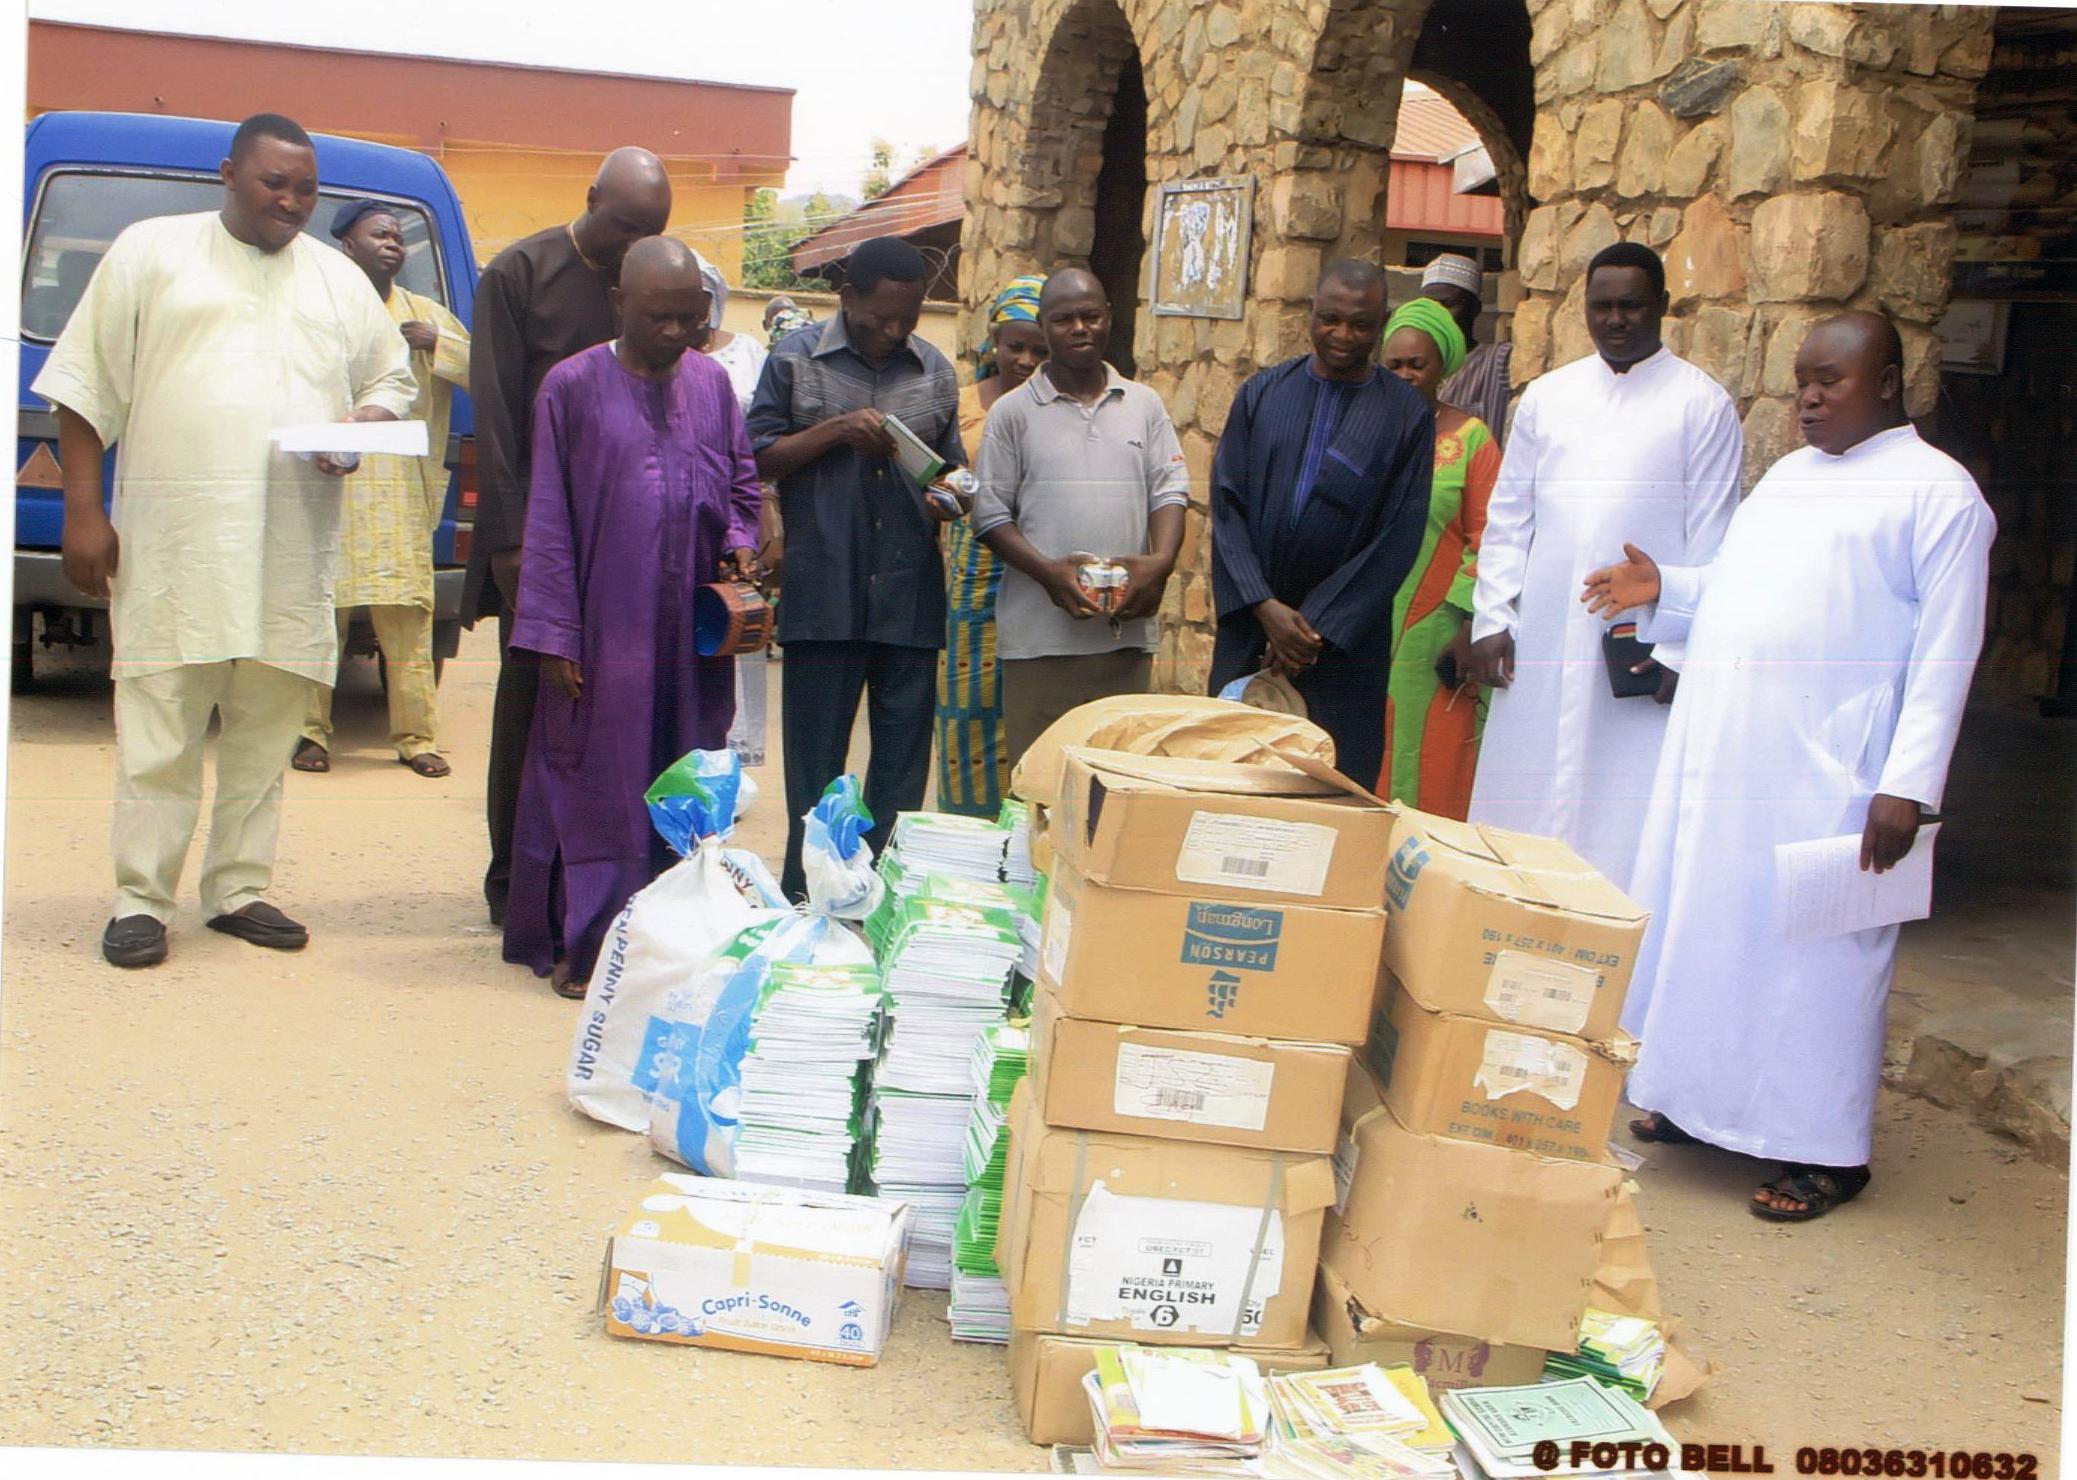 CKC EBIRA CATHOLIC COMMUNITY DONATES BOOKS TO SCHOOLS IN OKENE DEANARY, LOKOJA DIOCESE, KOGI STATE